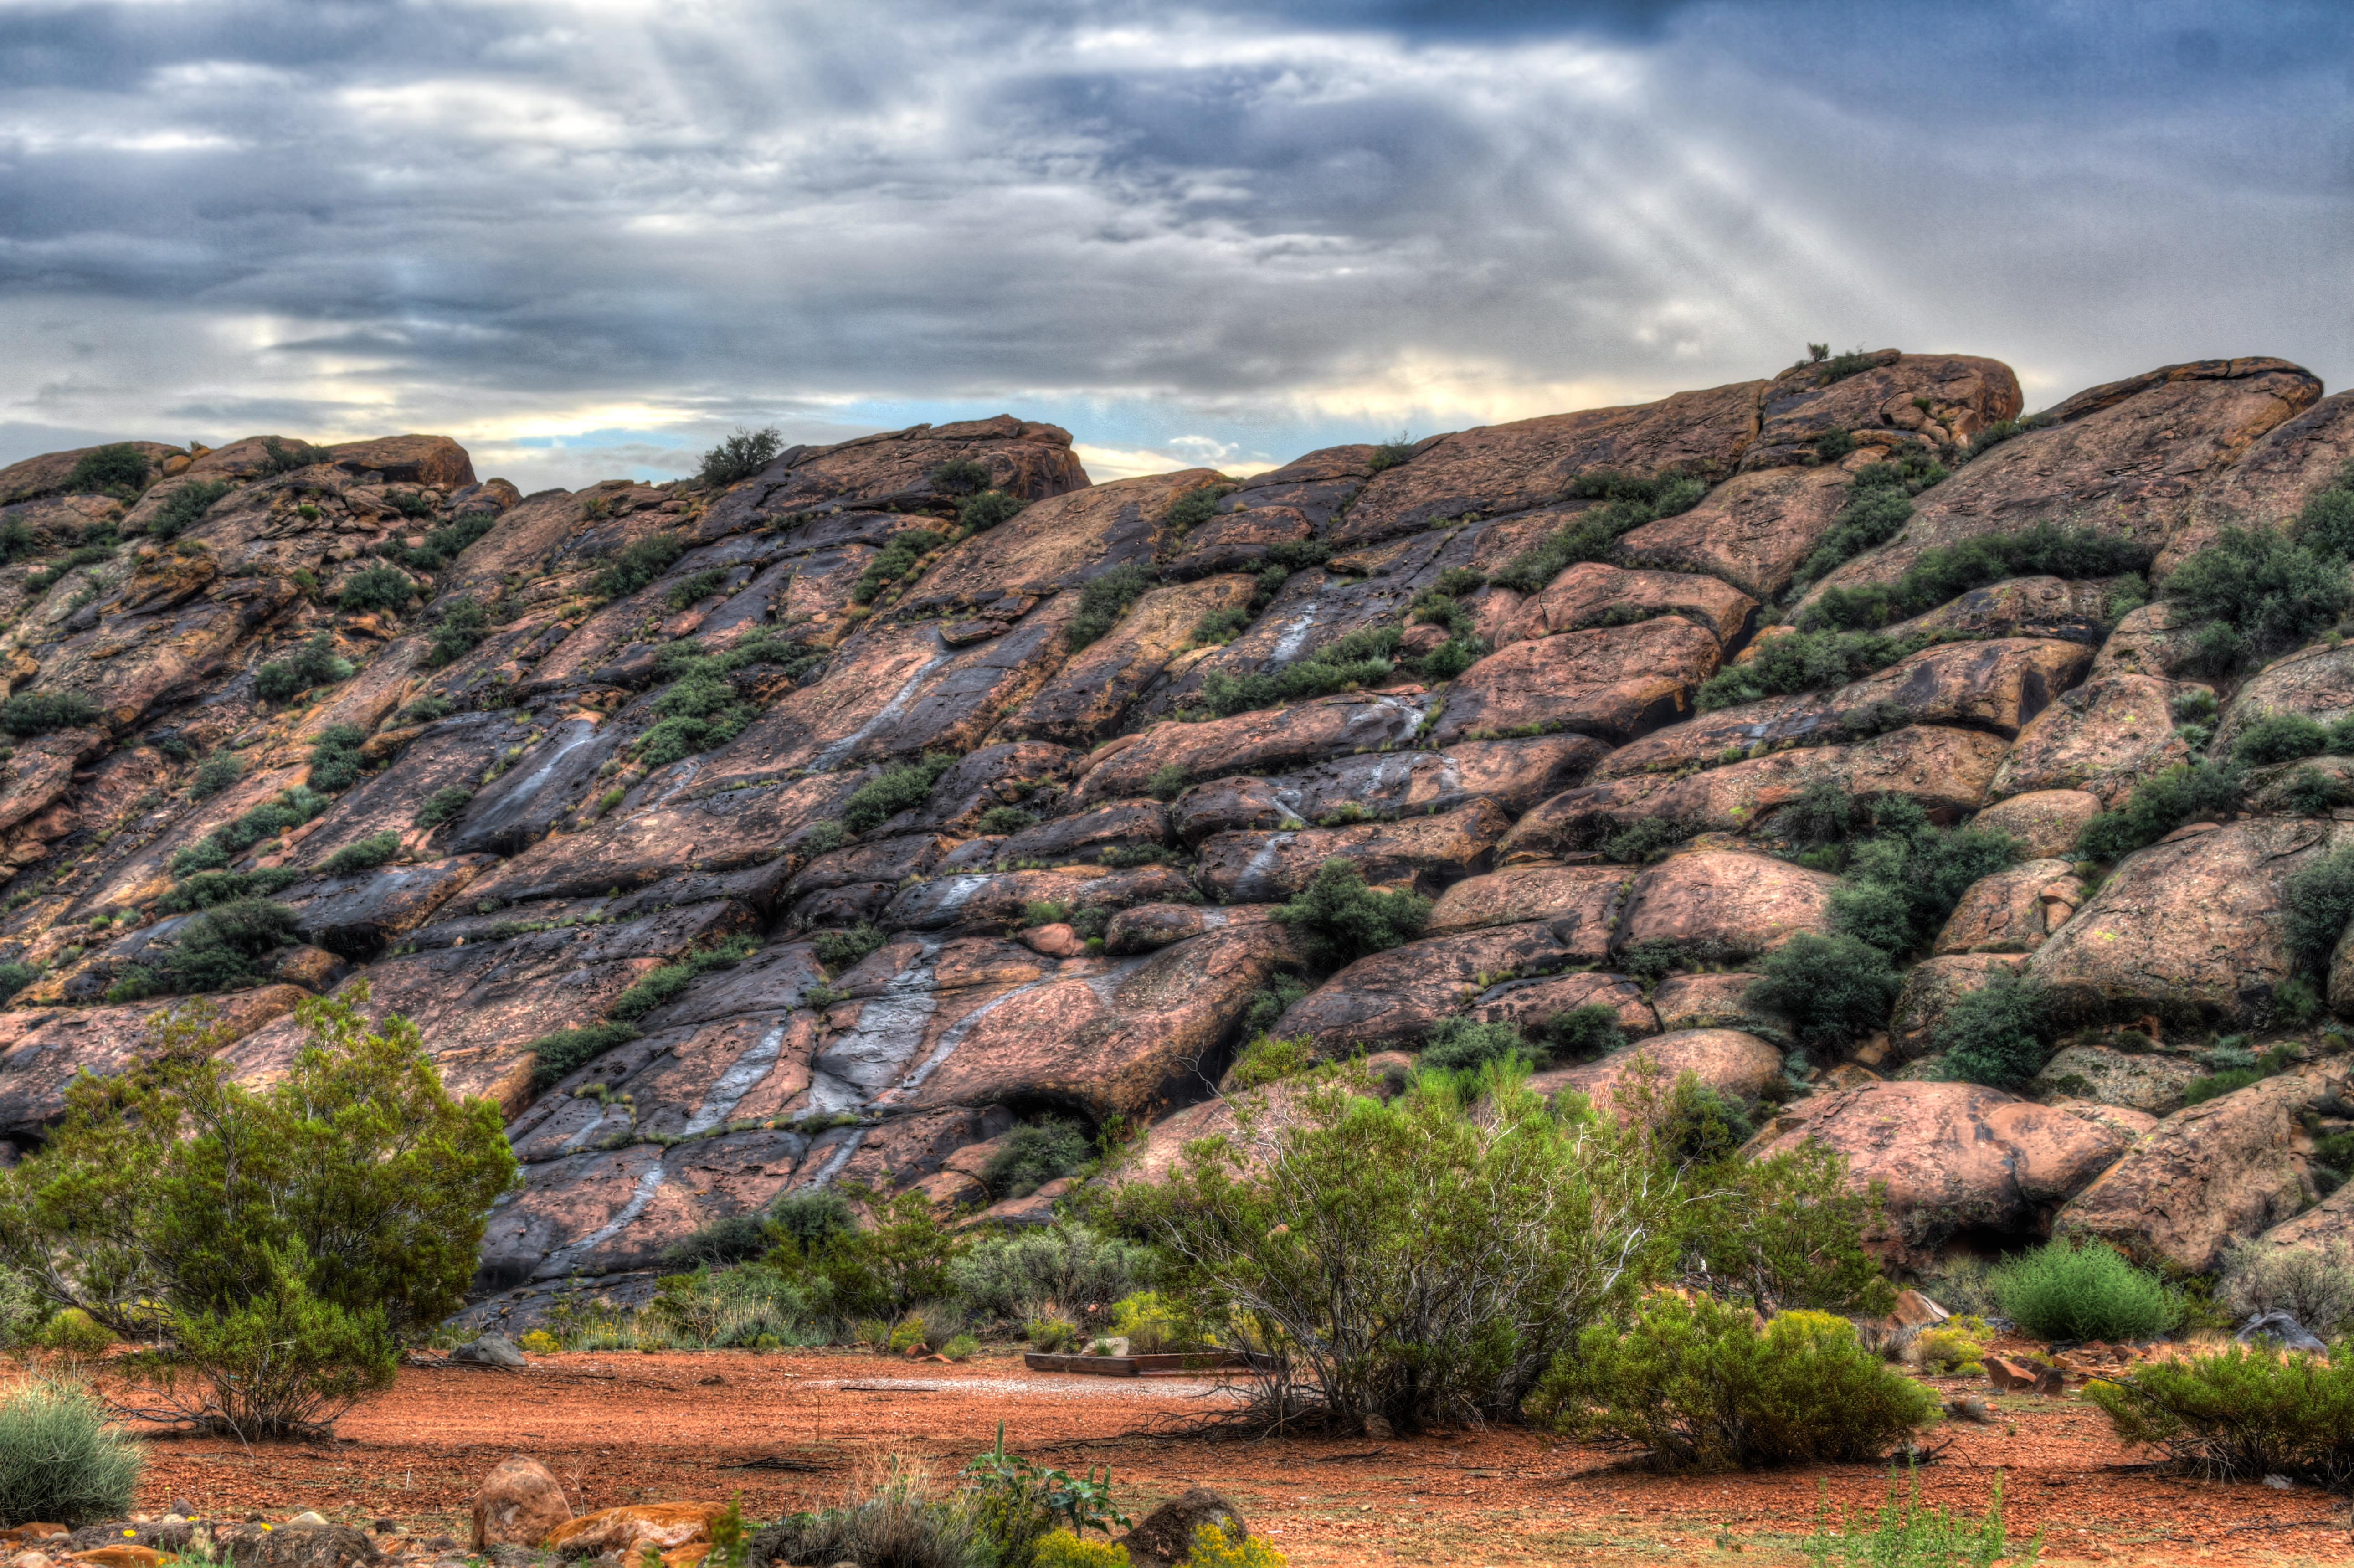 Rain on Rocks photo